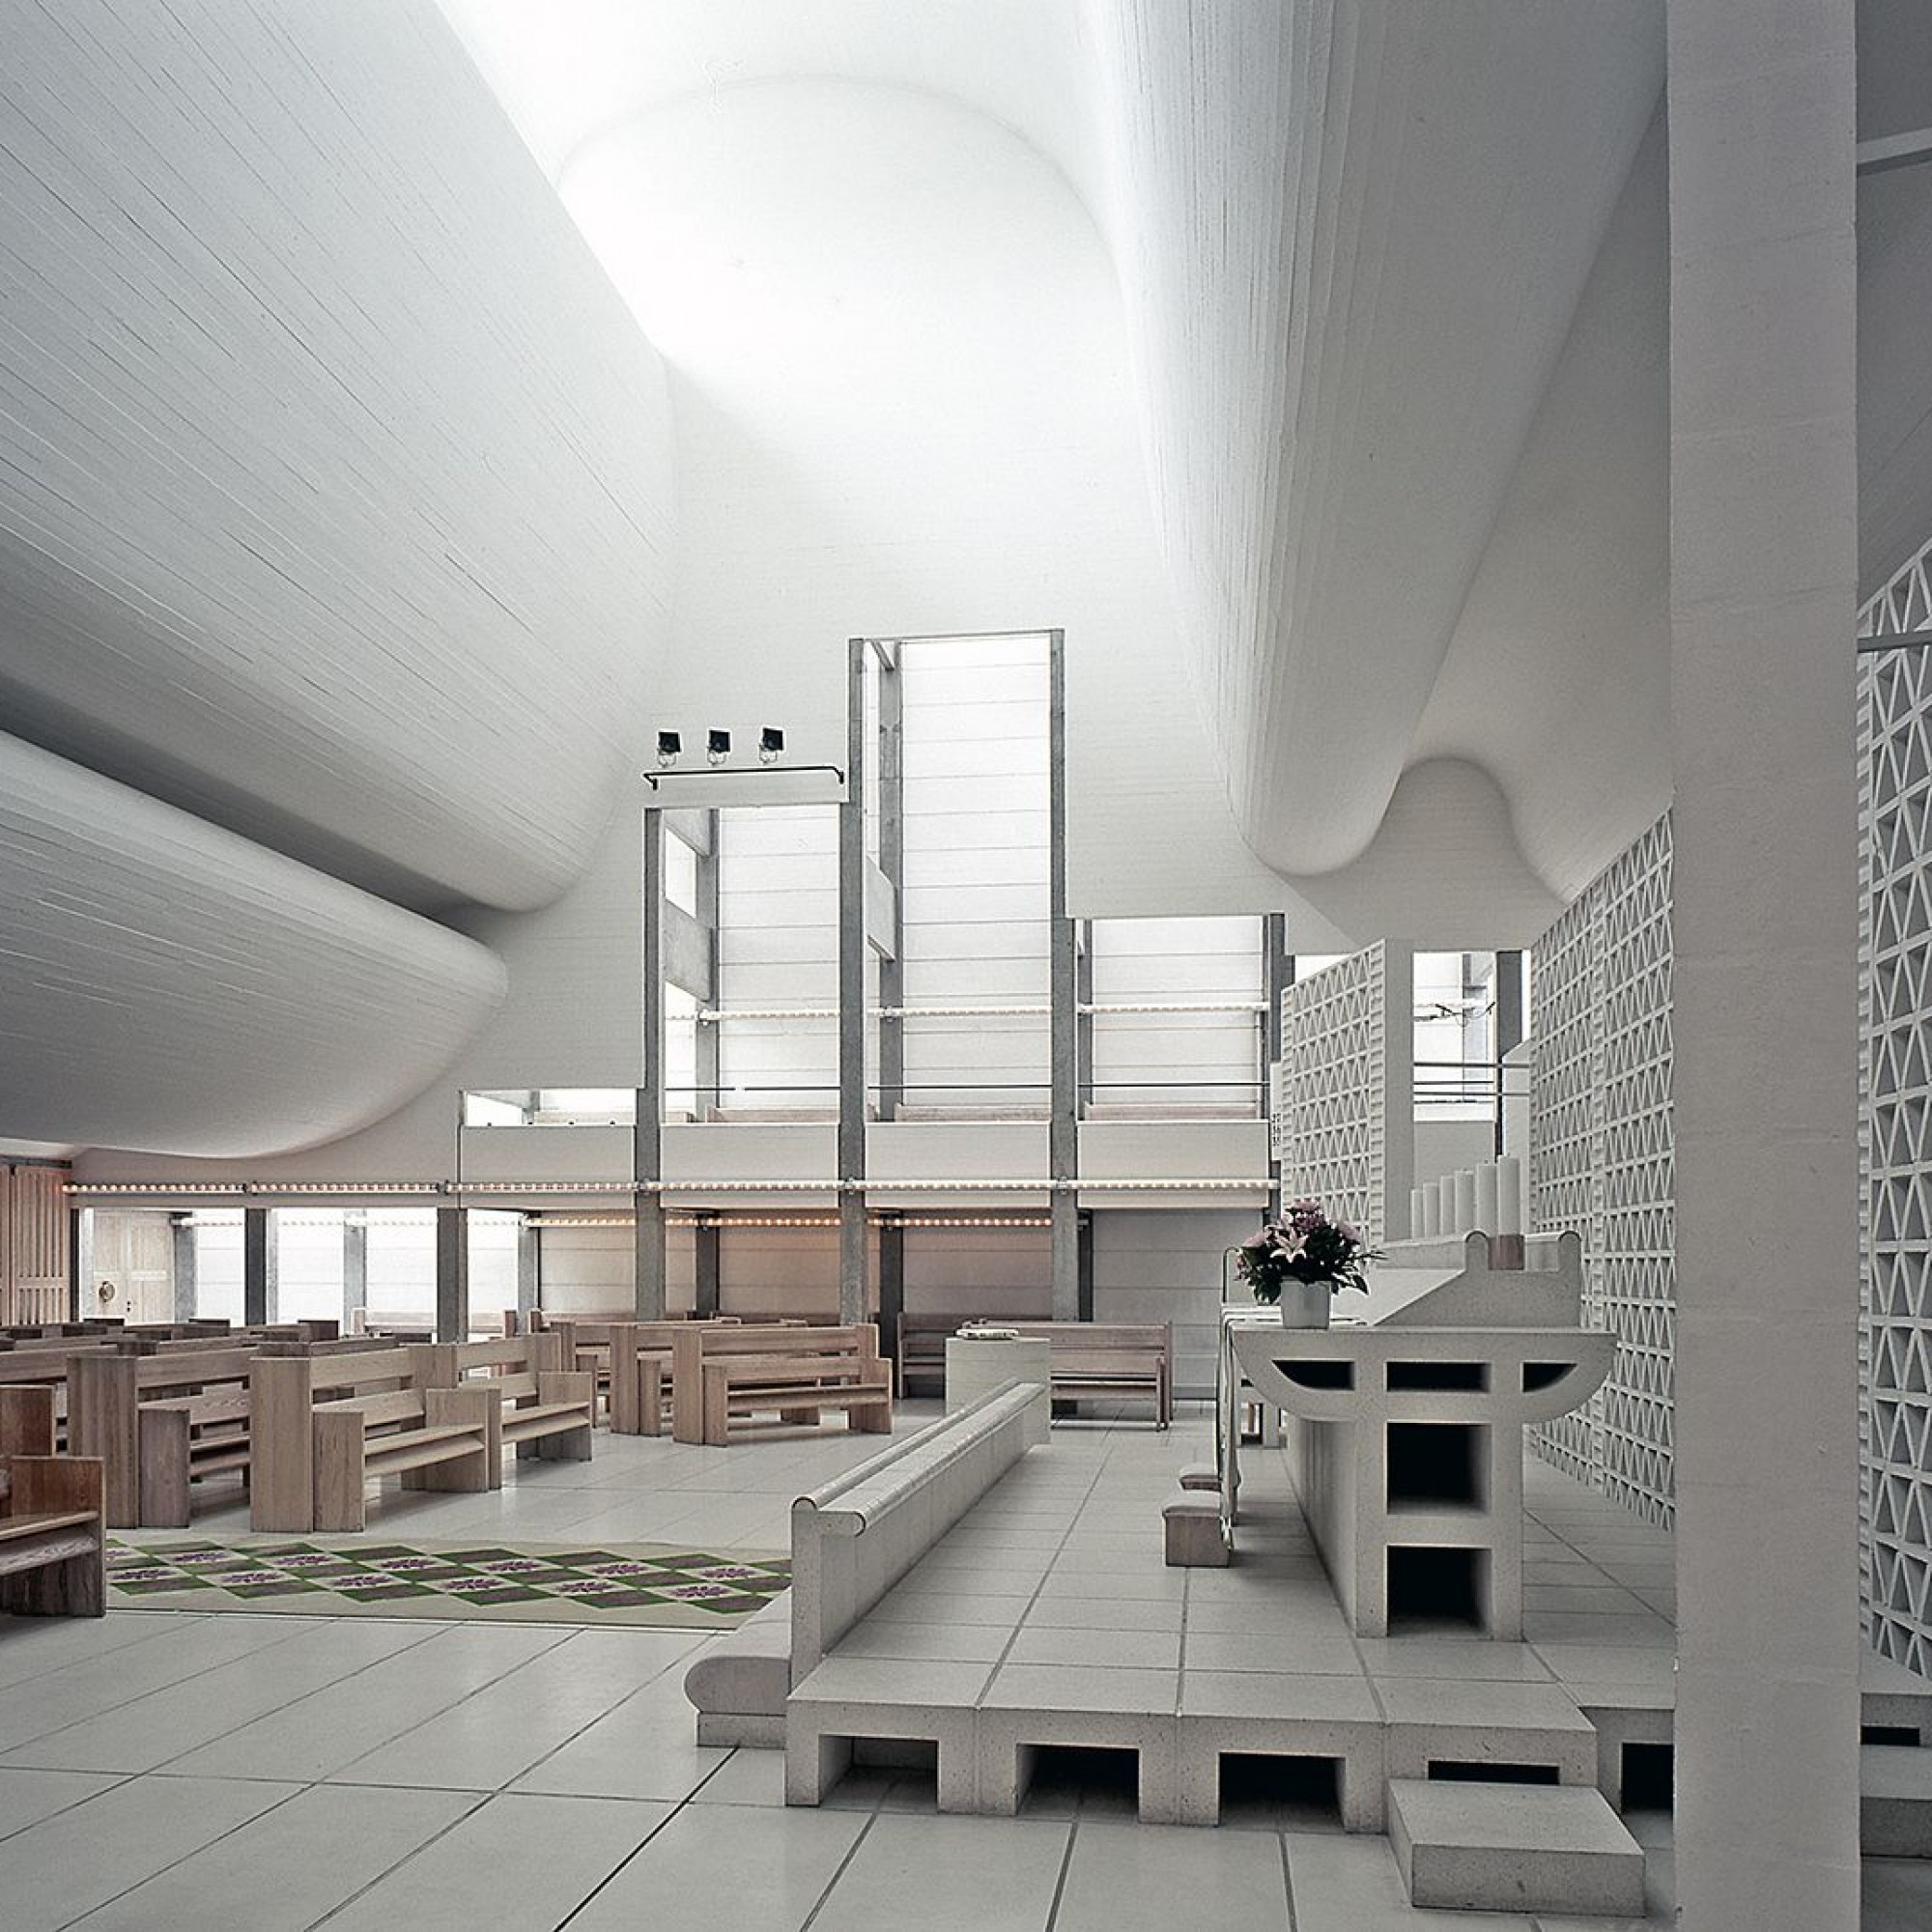 Innenansicht, Bagsværd Kirche, Bagsværd, Denmark von Jorn Utzøn